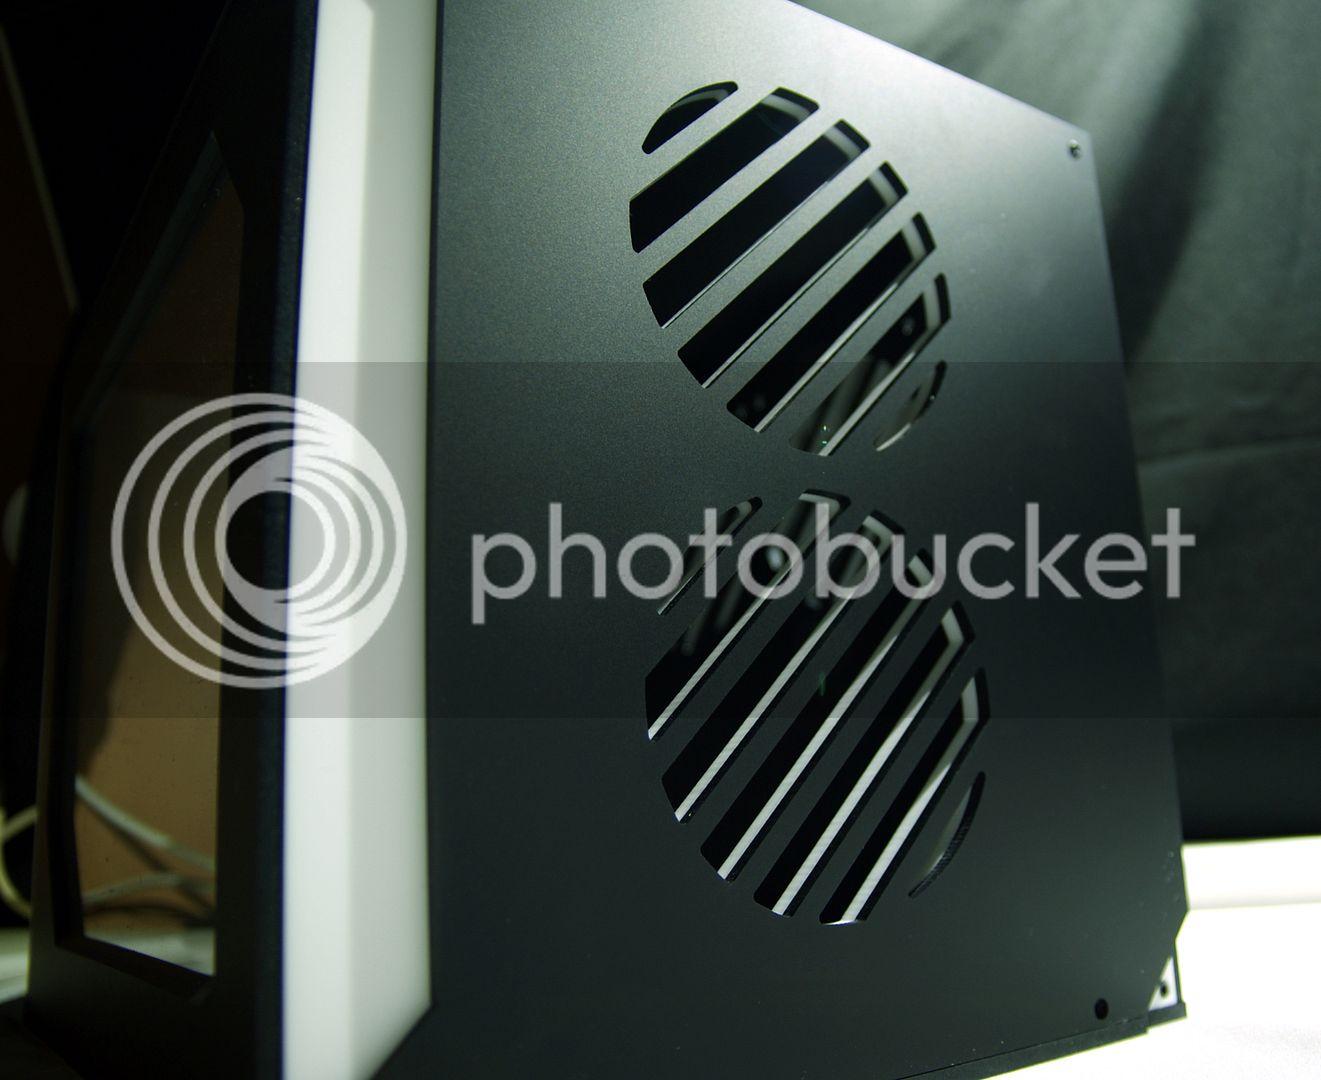 http://i759.photobucket.com/albums/xx233/kier1976/NEW/Parvum/P2/DSC00141.jpg